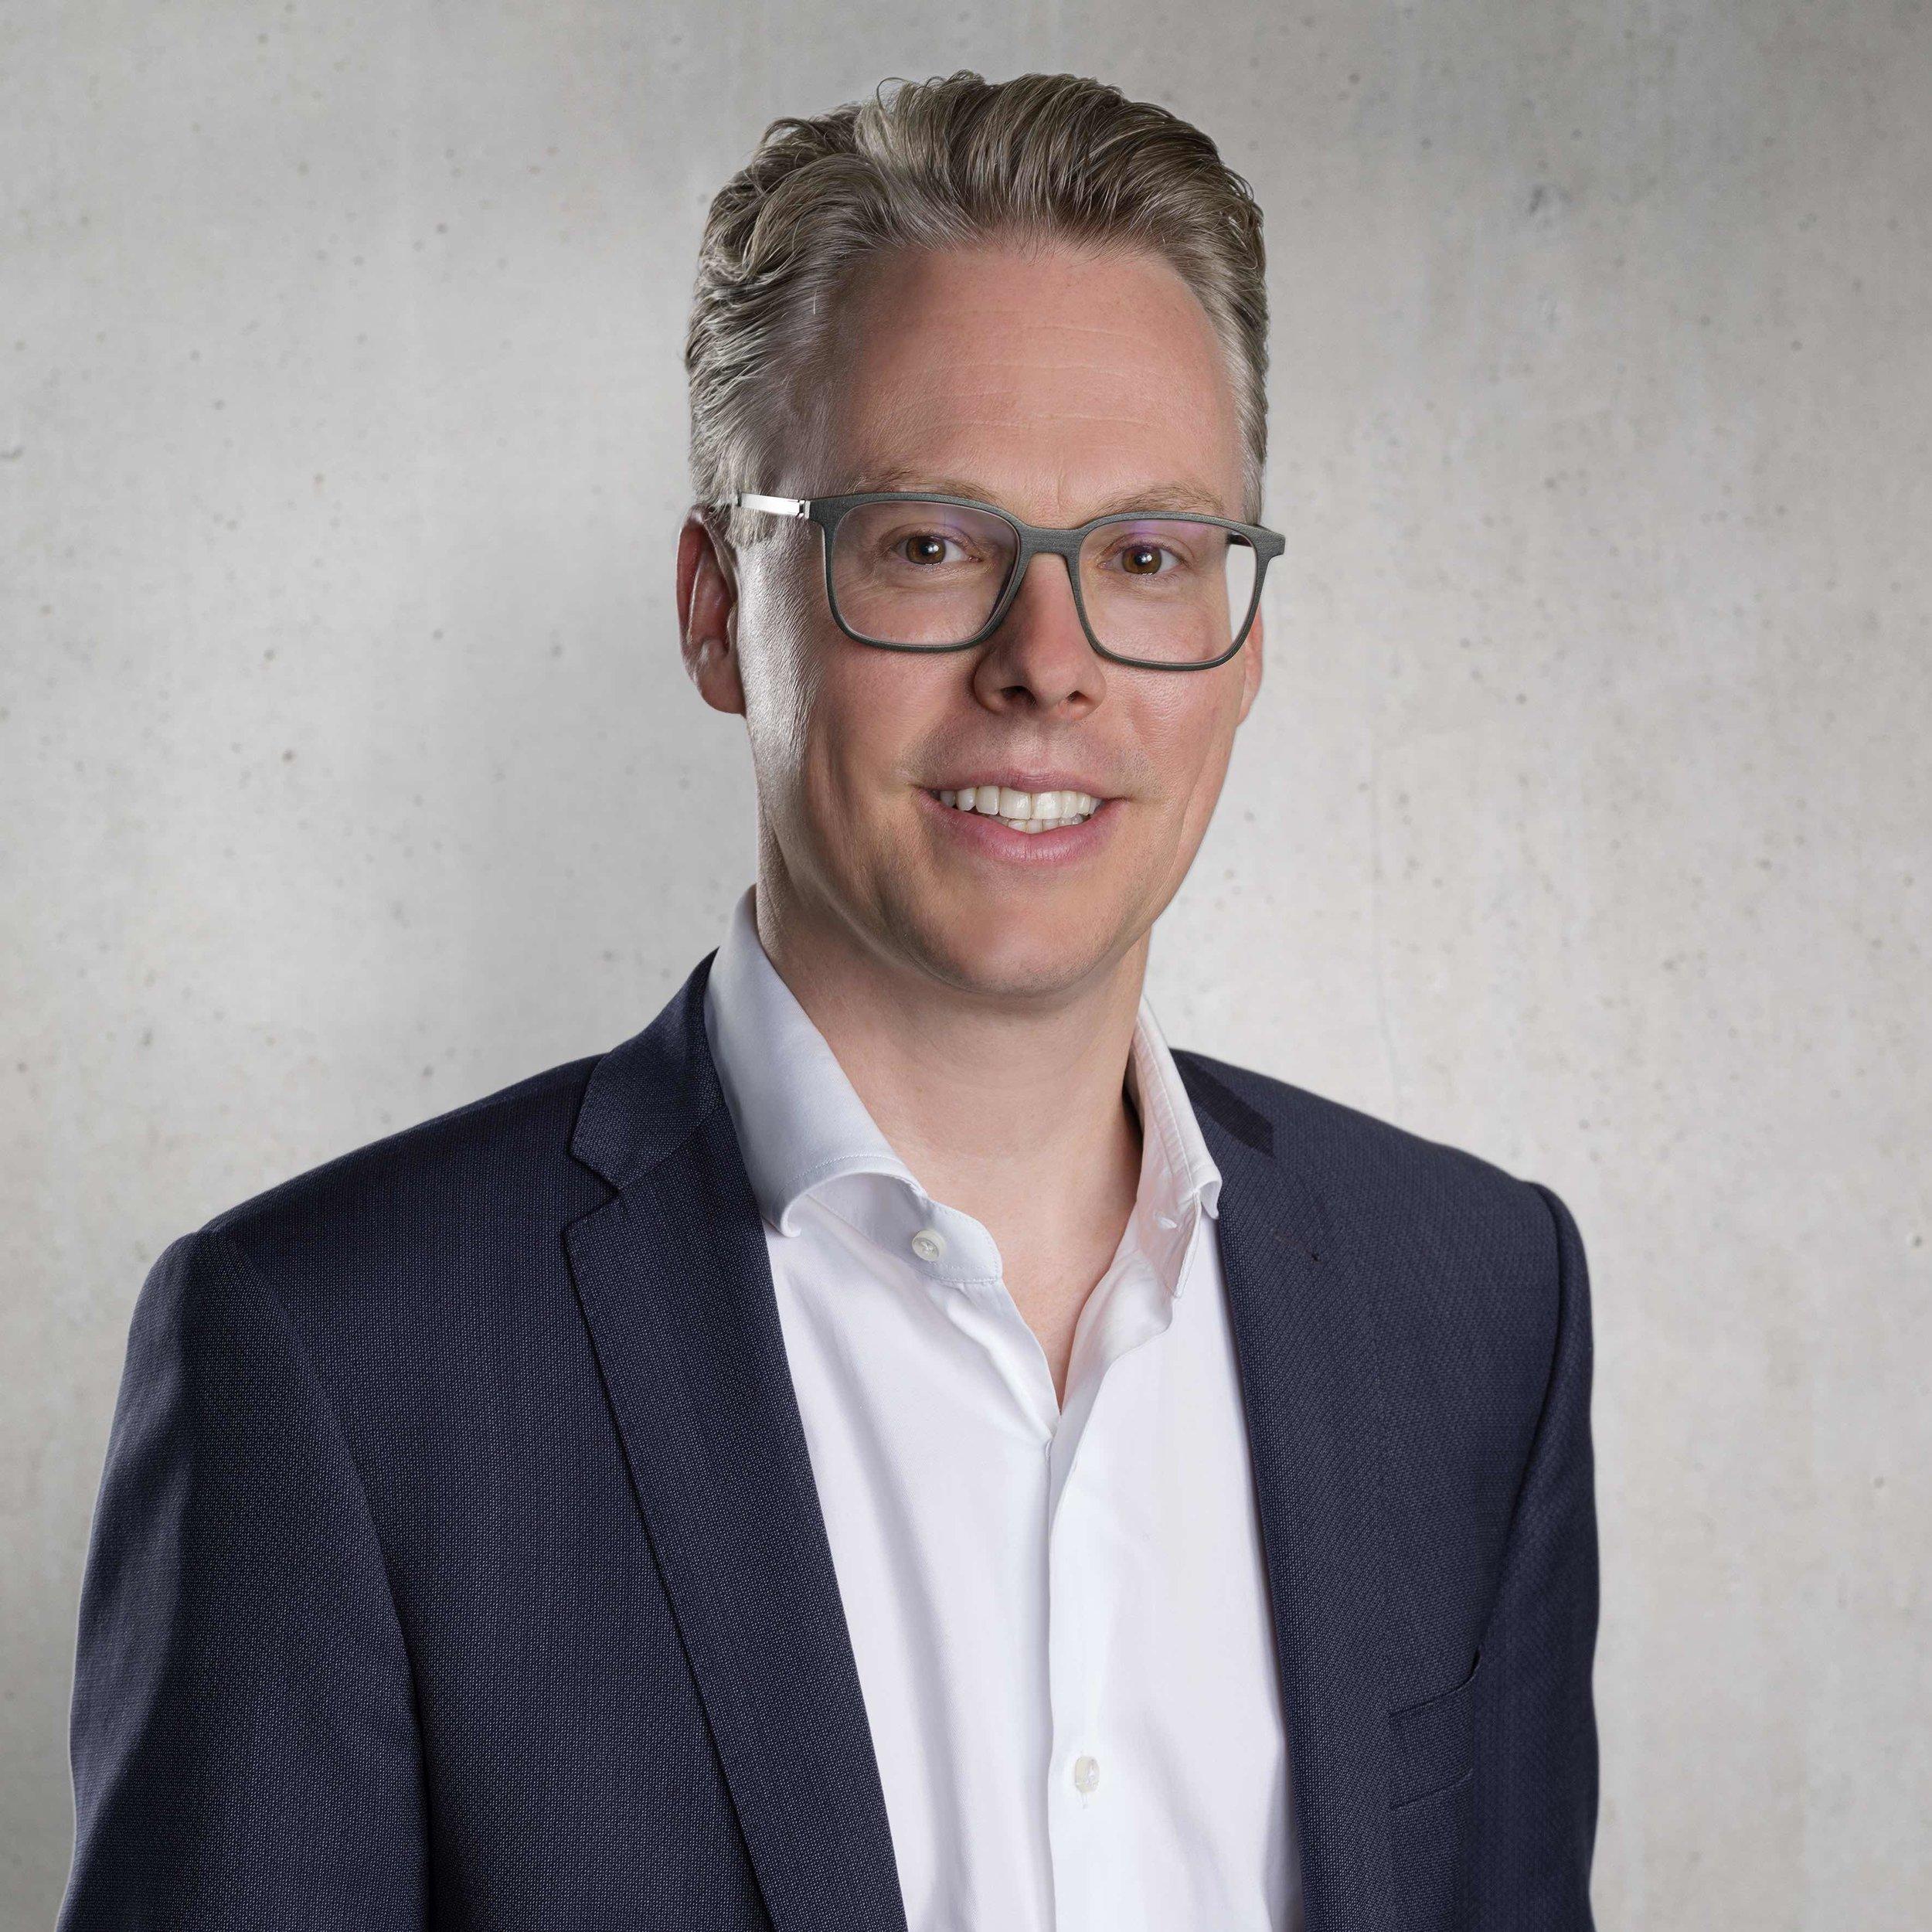 Jan Schoch, Partner - CEOemail: jan.schoch@anovapartners.comdirect no.: +41 44 215 24 61